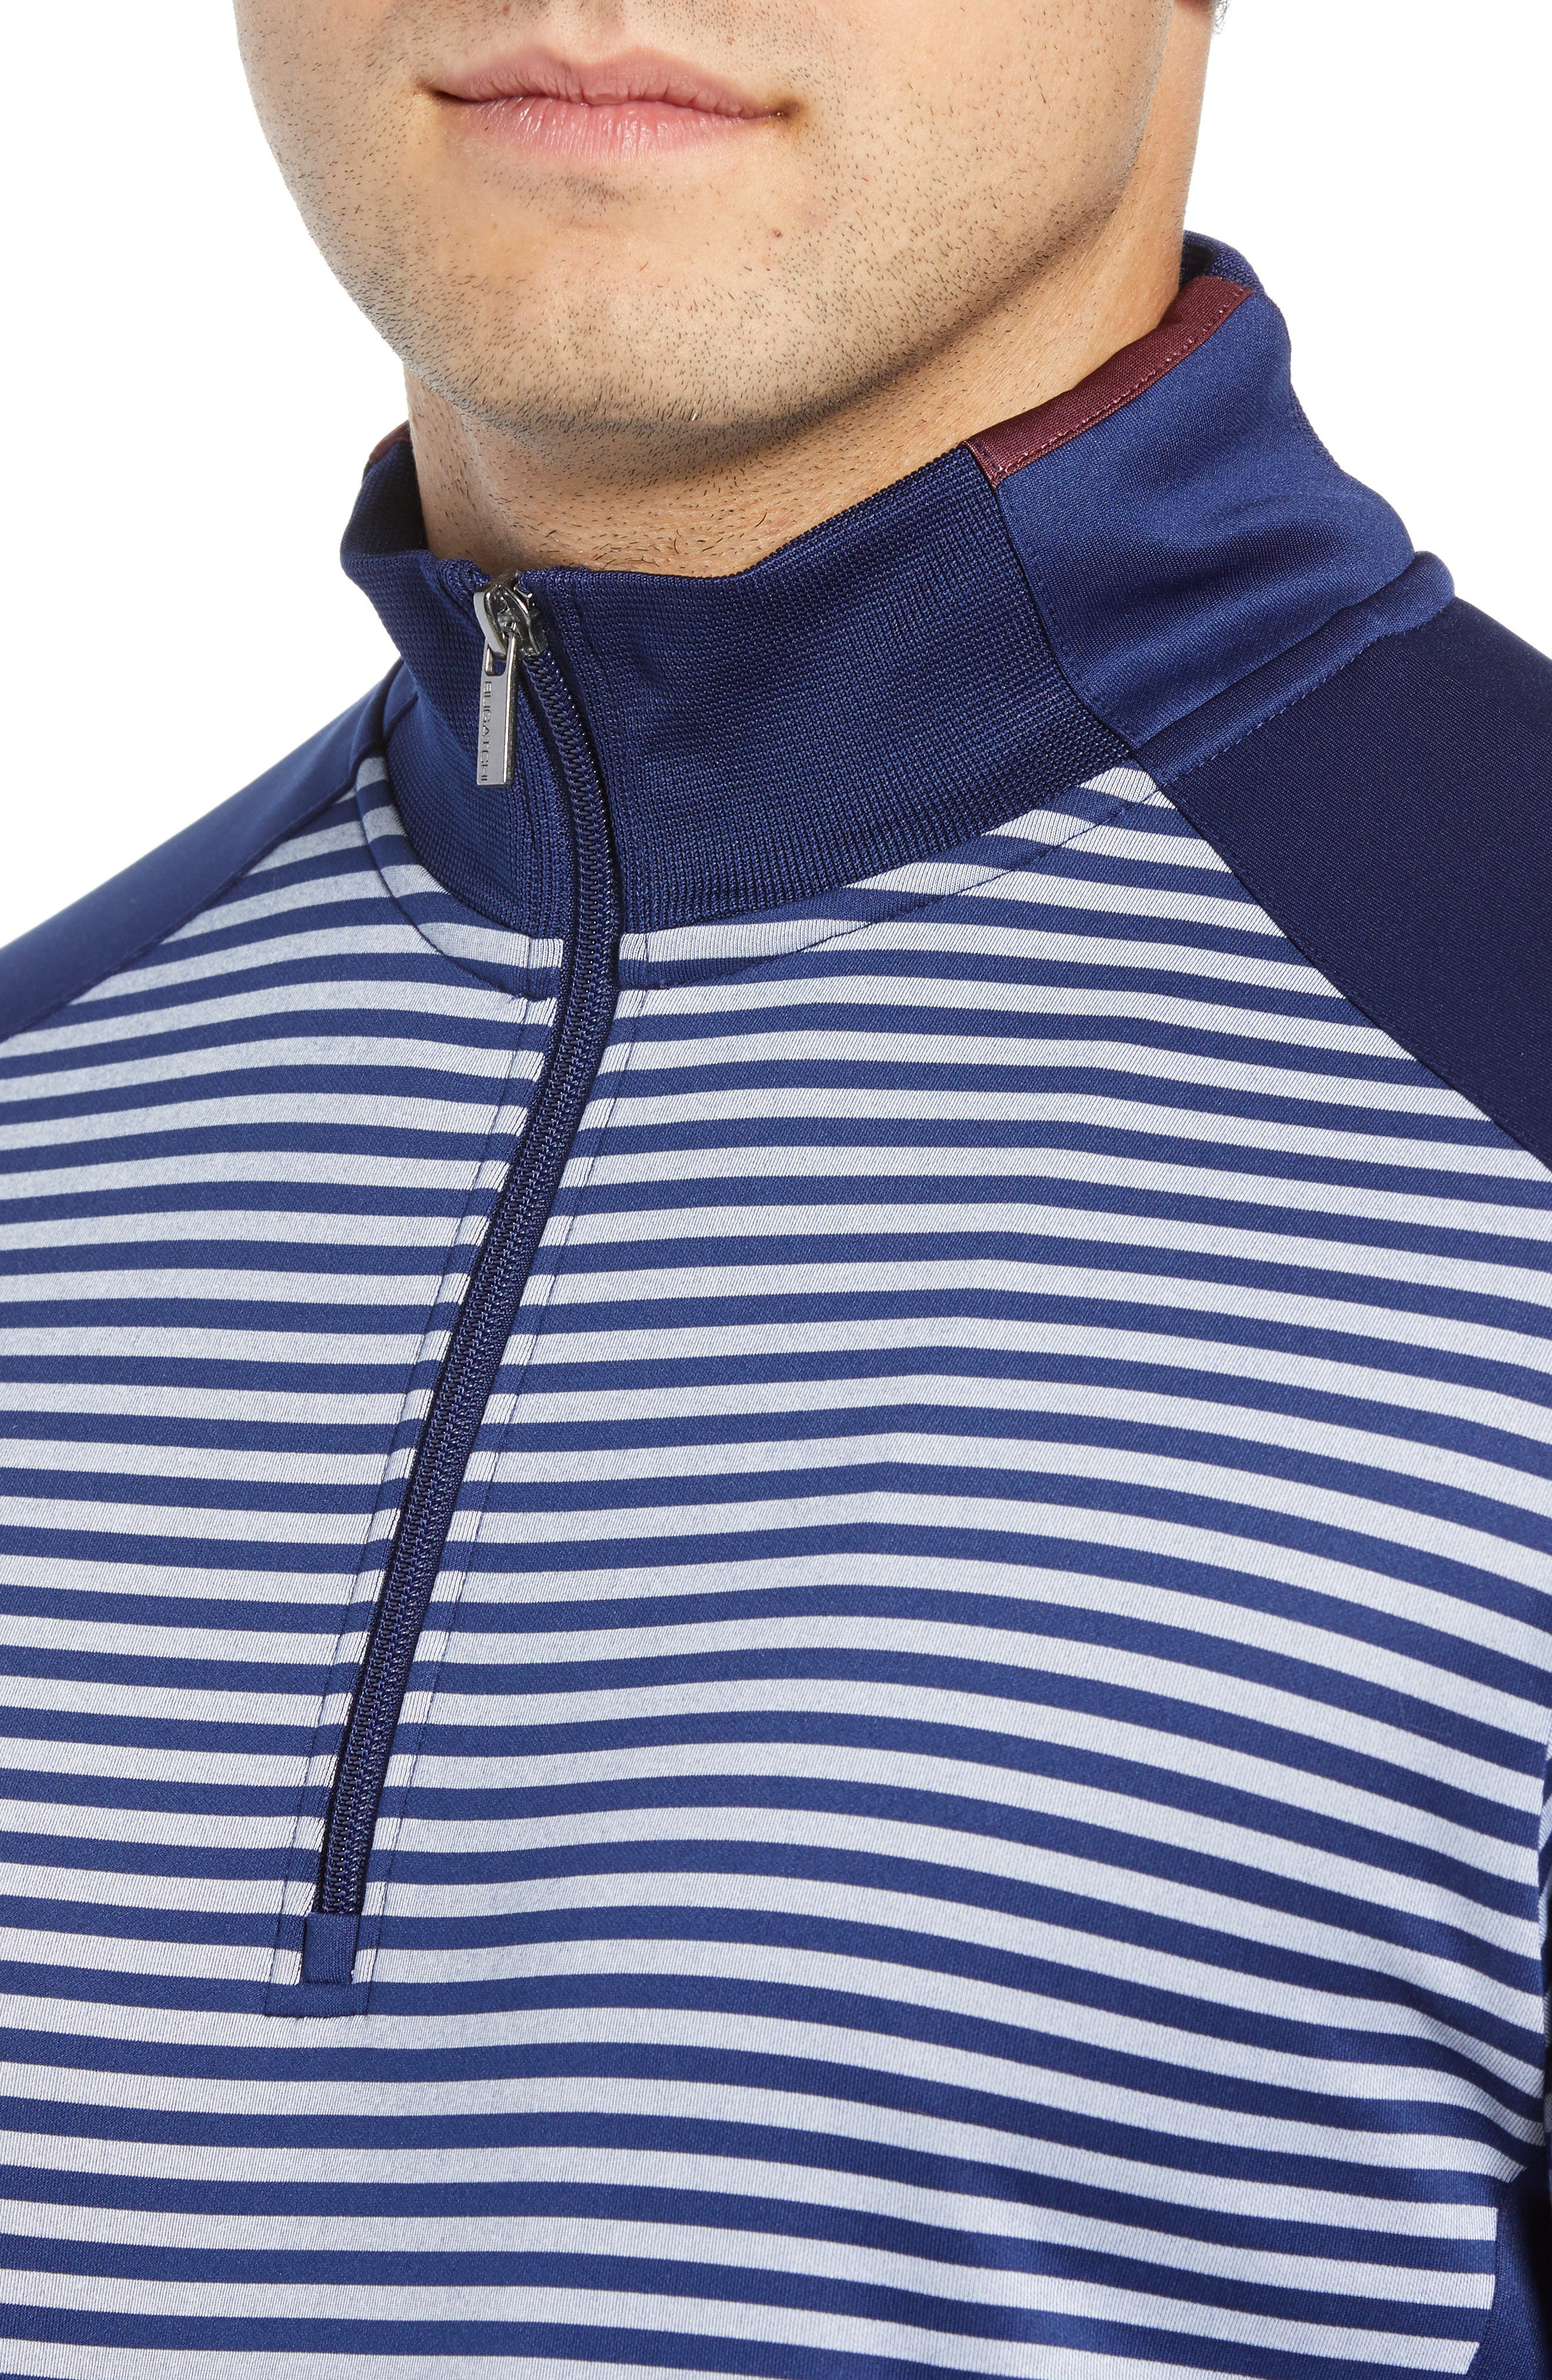 Regular Fit Stripe Quarter Zip Pullover,                             Alternate thumbnail 4, color,                             NAVY